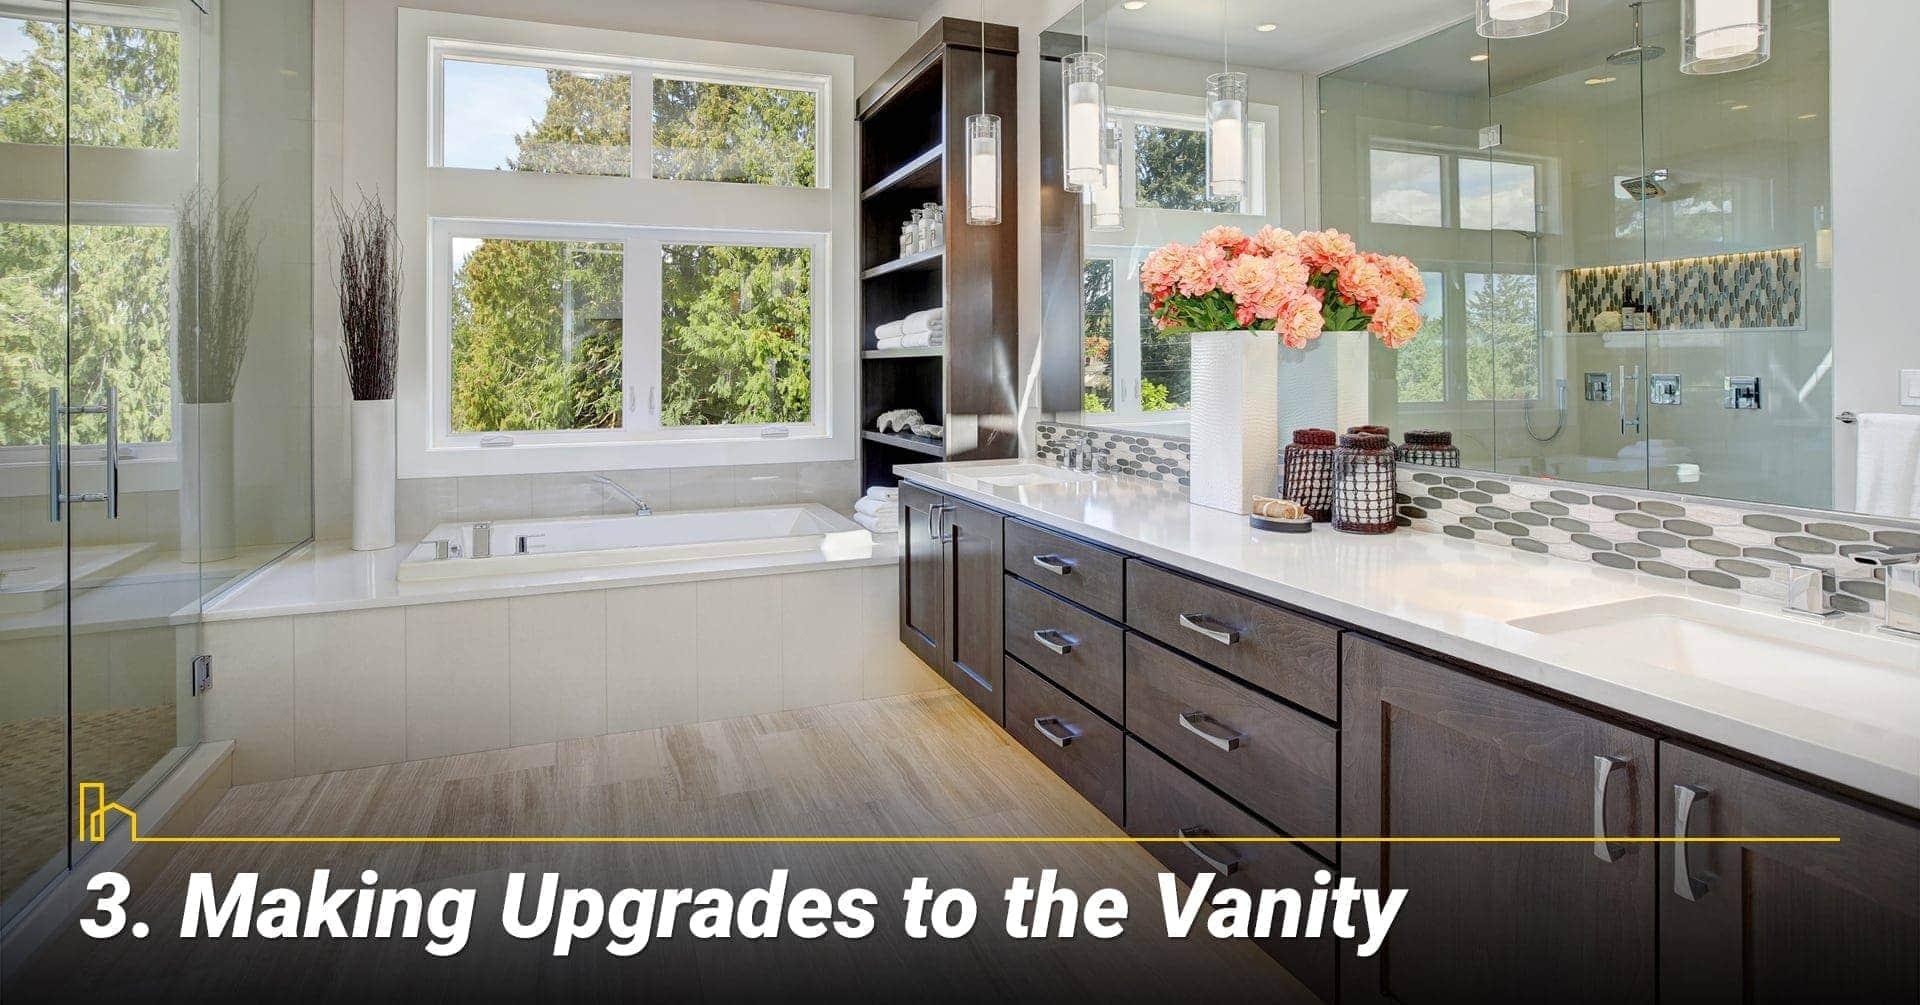 Making Upgrades to the Vanity, upgrade your bathroom with vanity